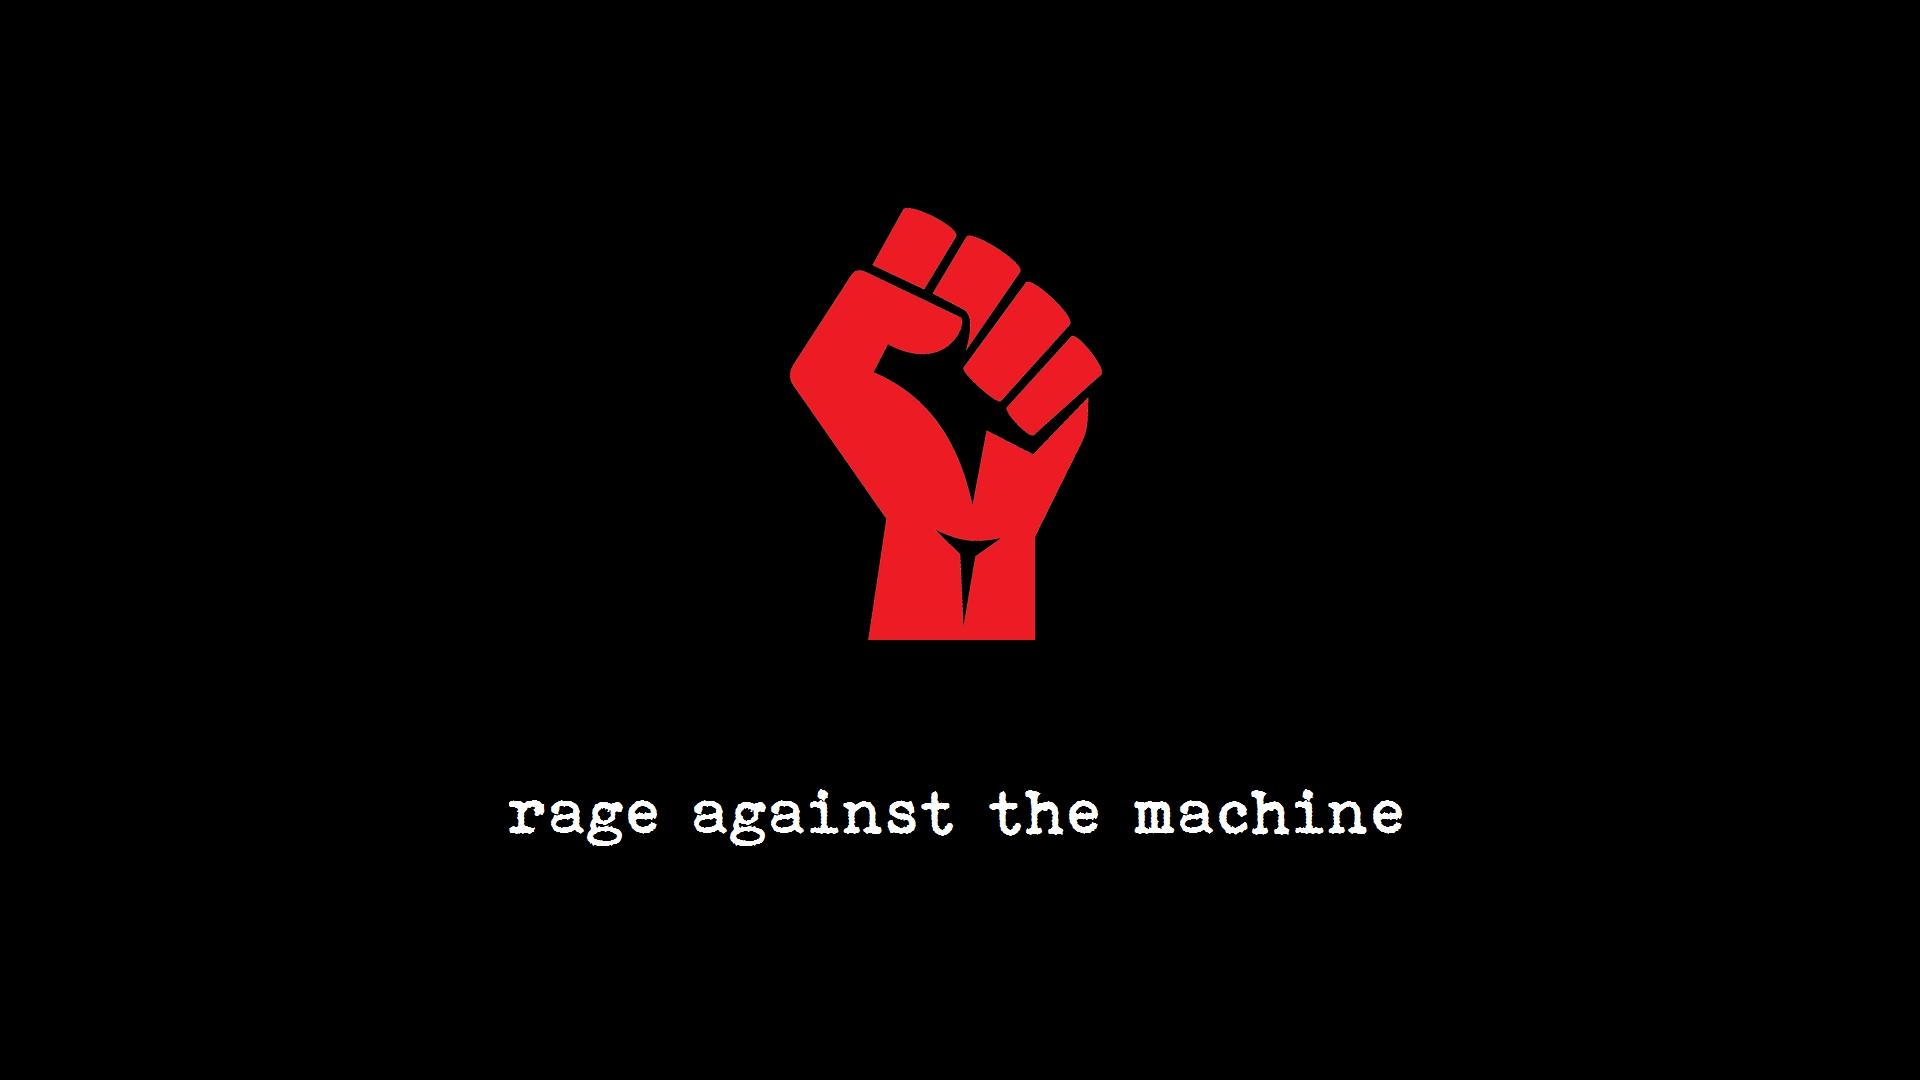 rage against the machine wallpaper full hd fond d'écran and arrière